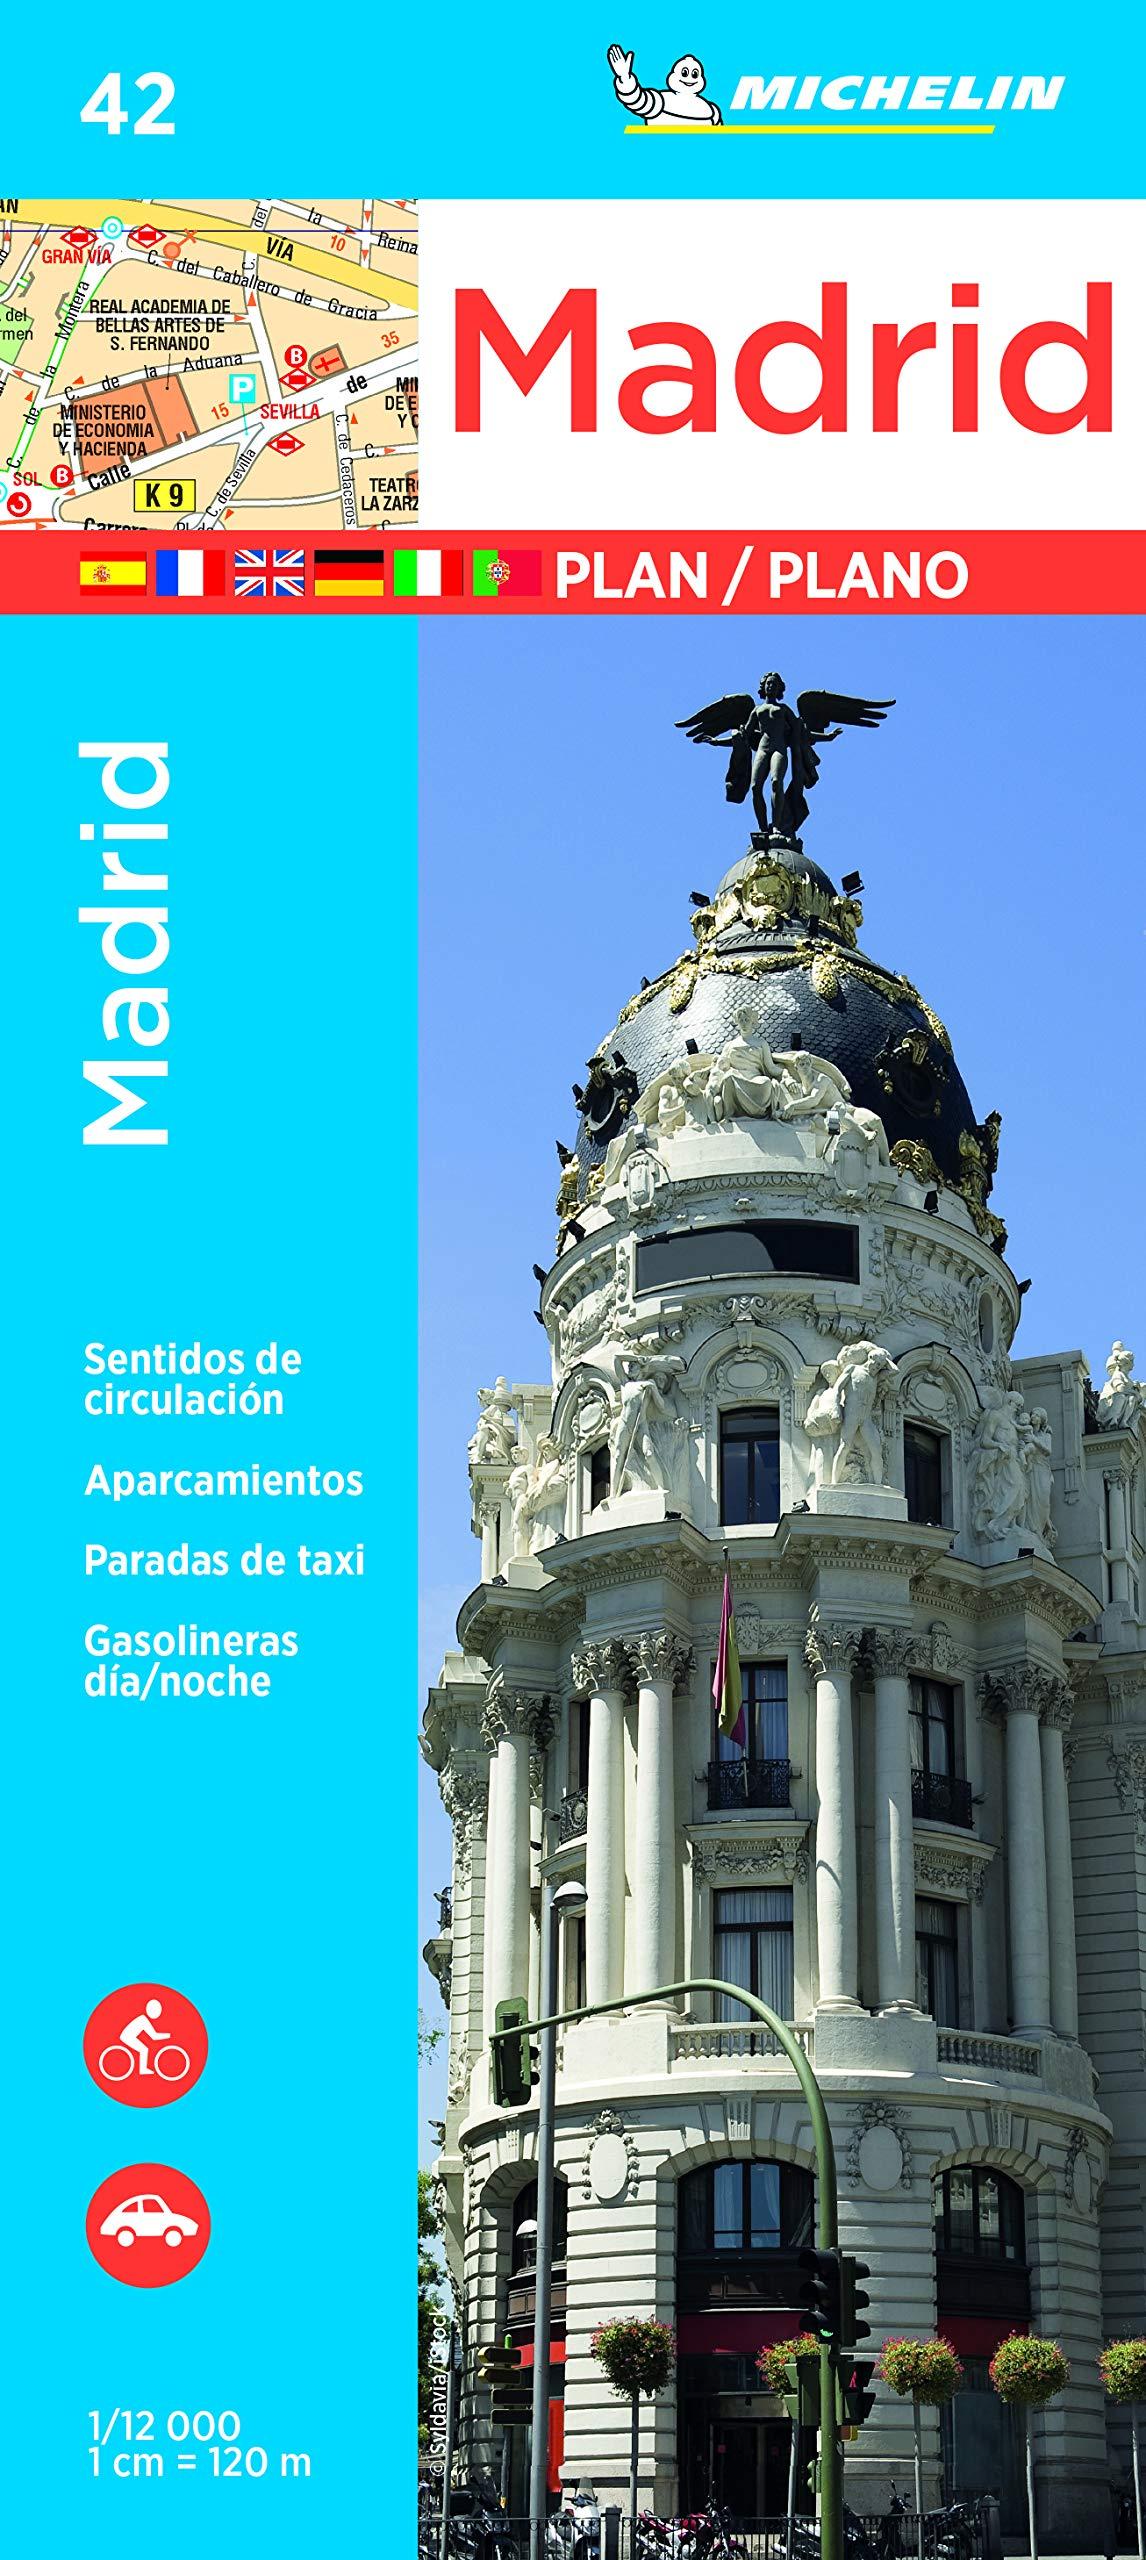 Madrid (Plano) (Planos Michelin): Amazon.es: MICHELIN: Libros